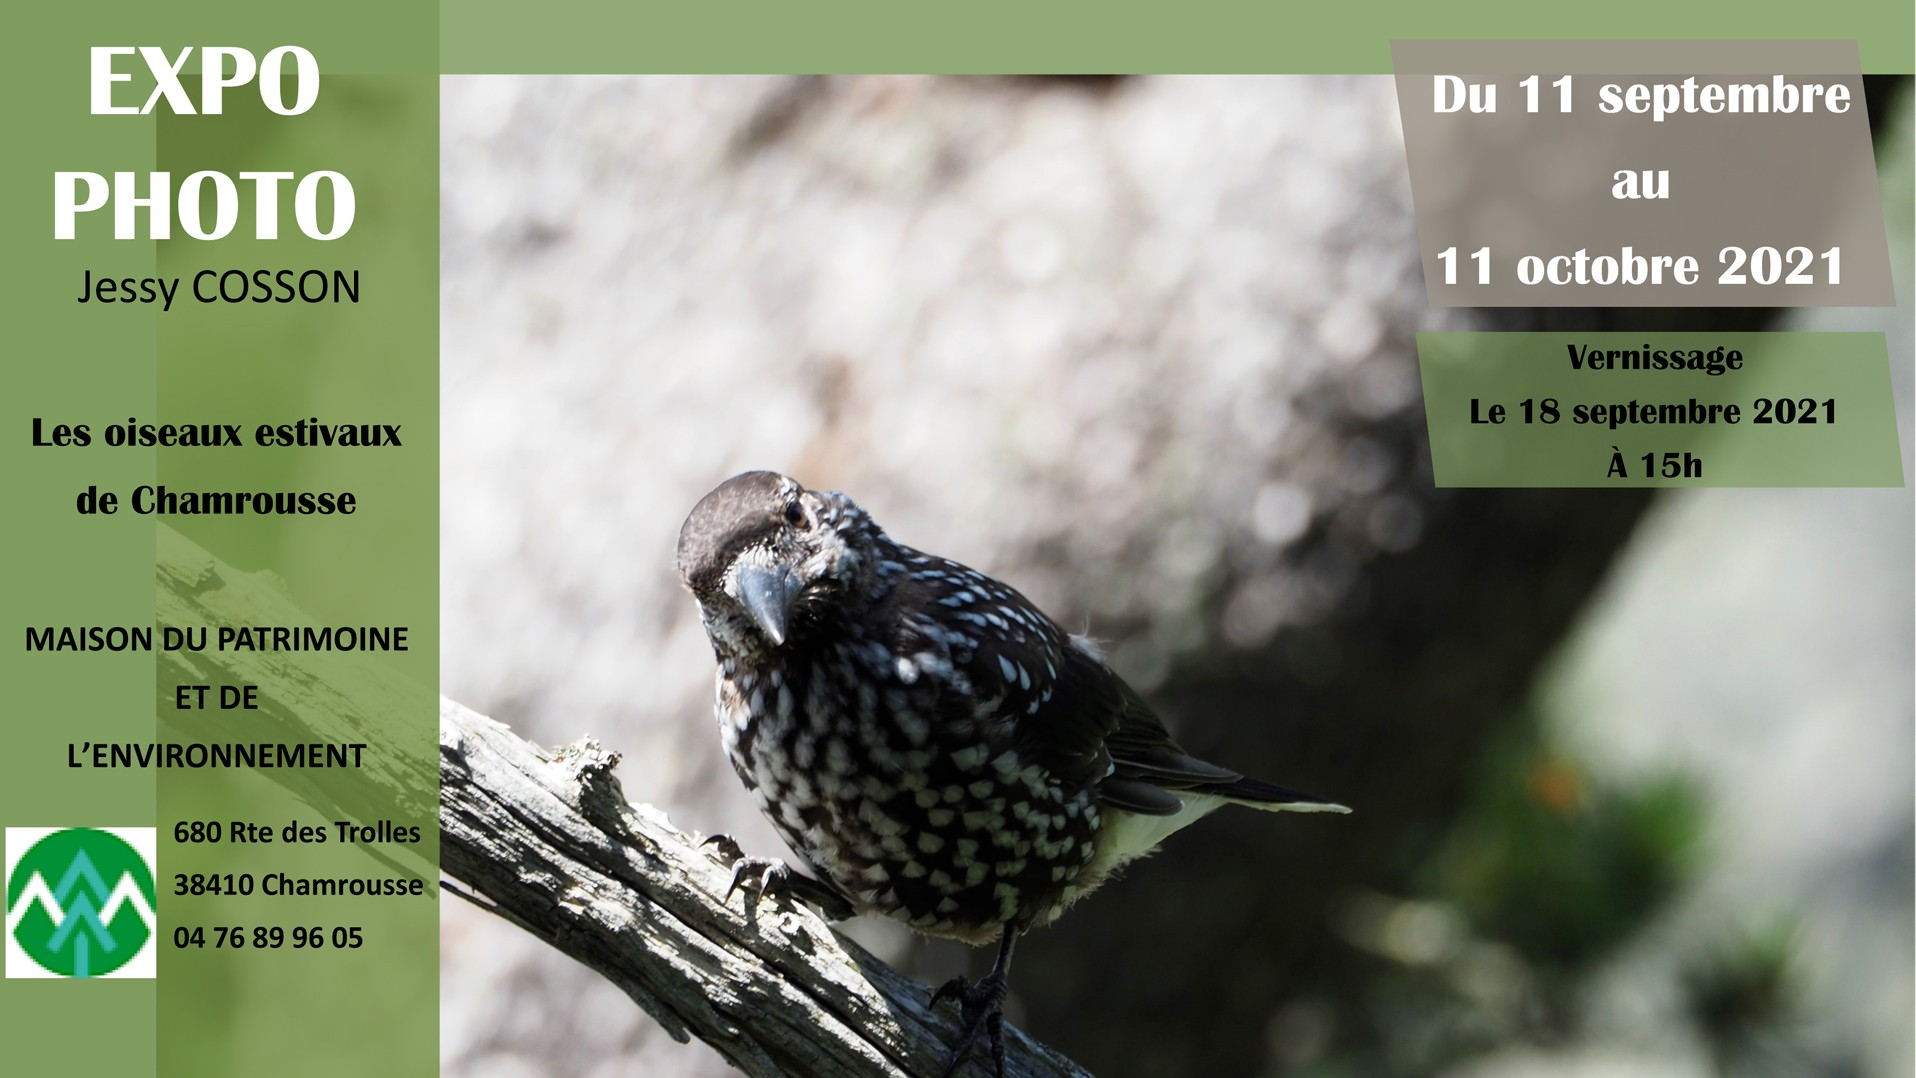 Chamrousse bird exhibition